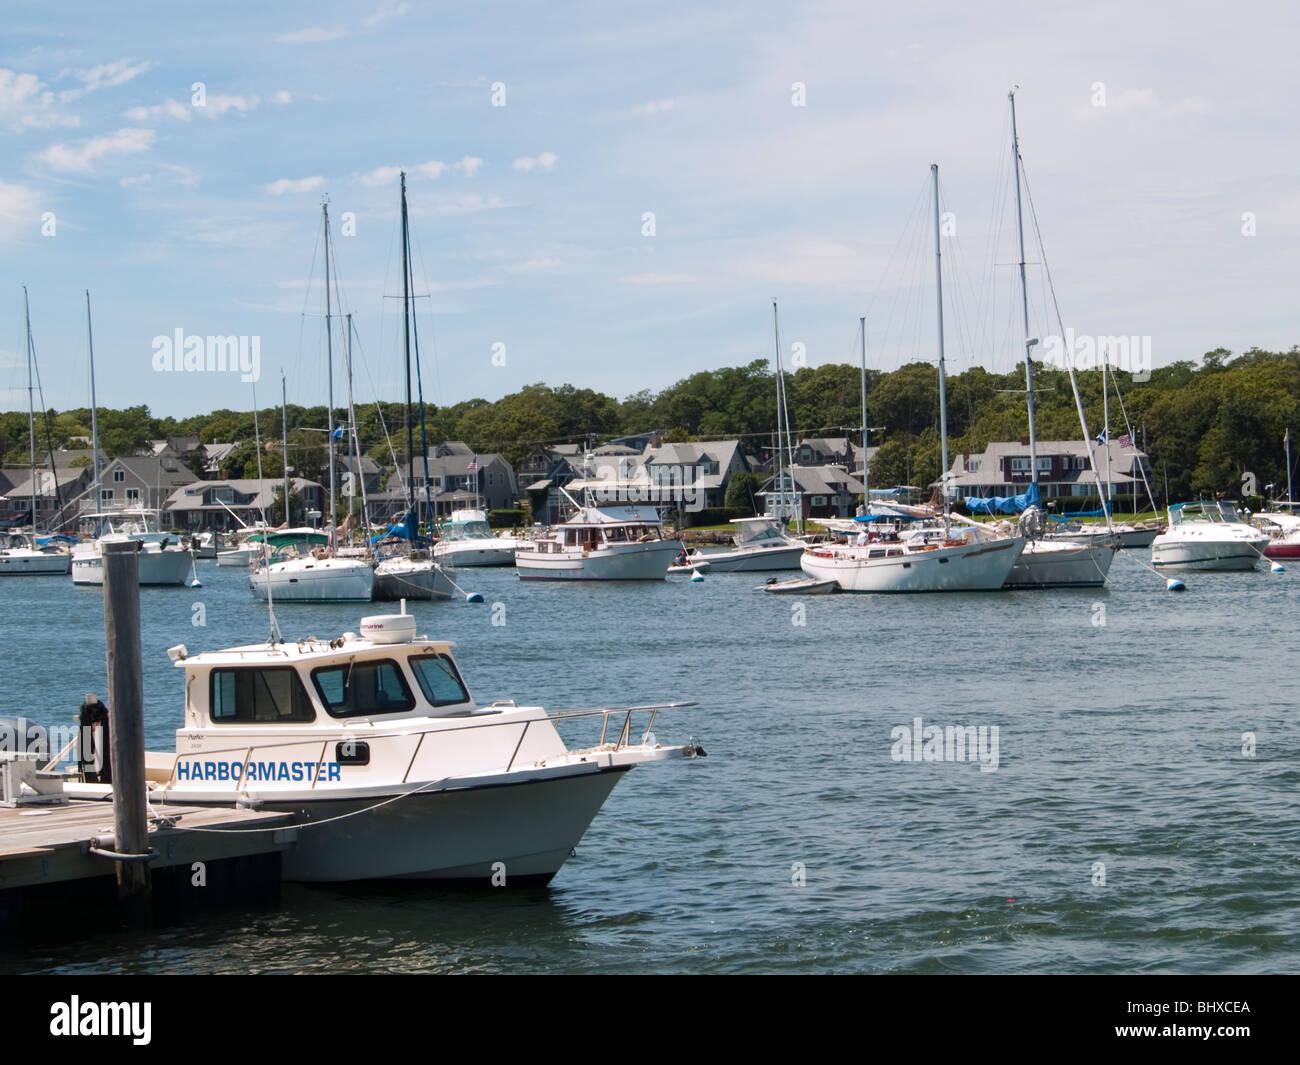 The harbor at Oak Bluffs Martha's Vineyard, Massachusetts USA - Stock Image